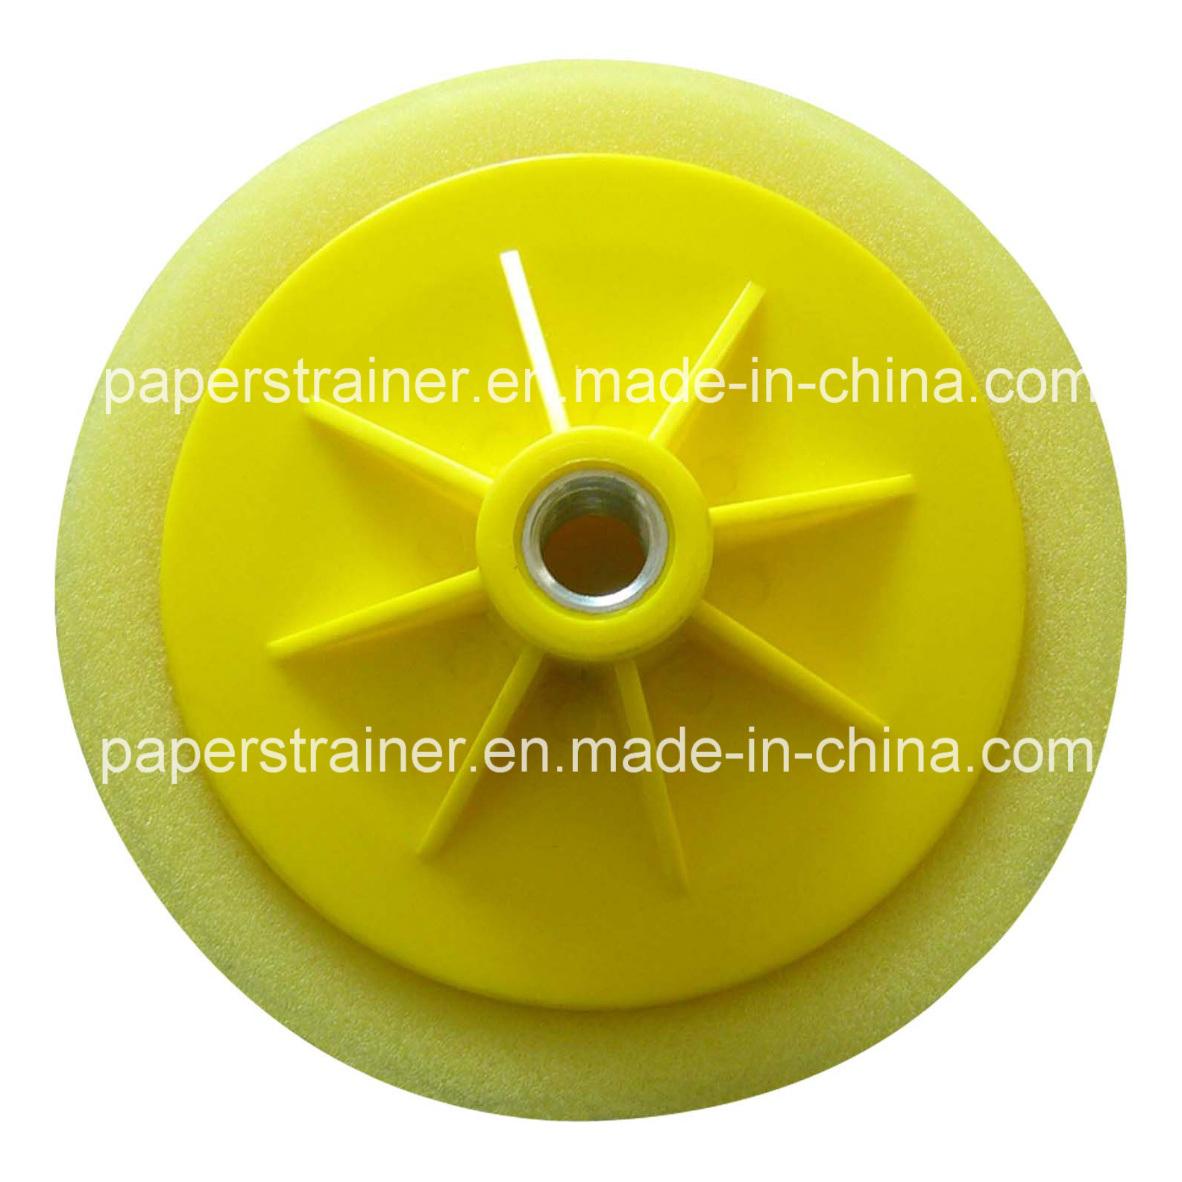 Foam Polishing Pad Yellow 150X45mm